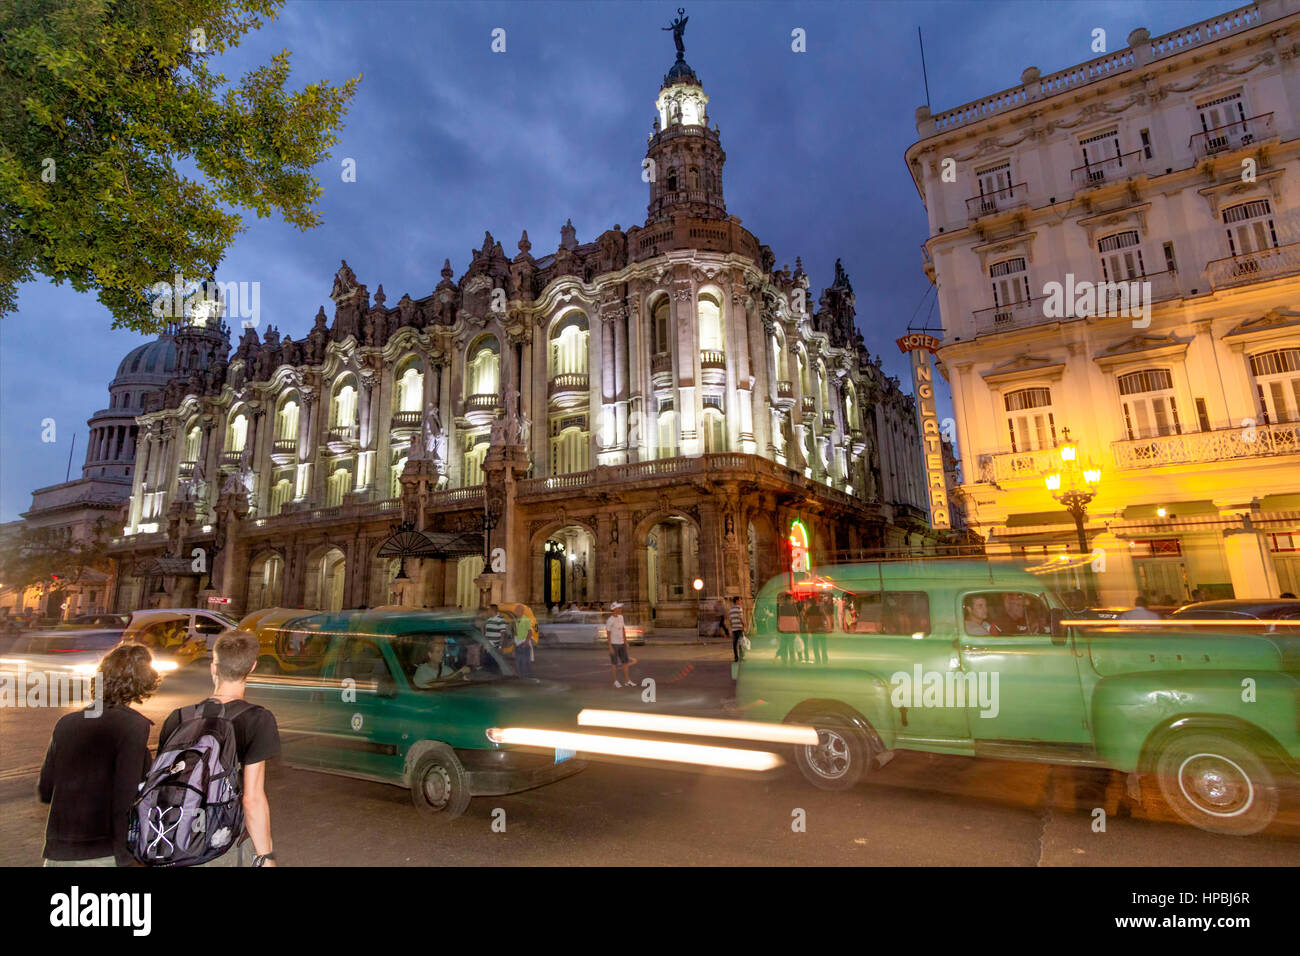 Gran Teatro de La Habana , Opera, Hotel Inglaterra, Paseo de Marti, Oldtimer, traffic, twilight, Havanna, Cuba Stock Photo